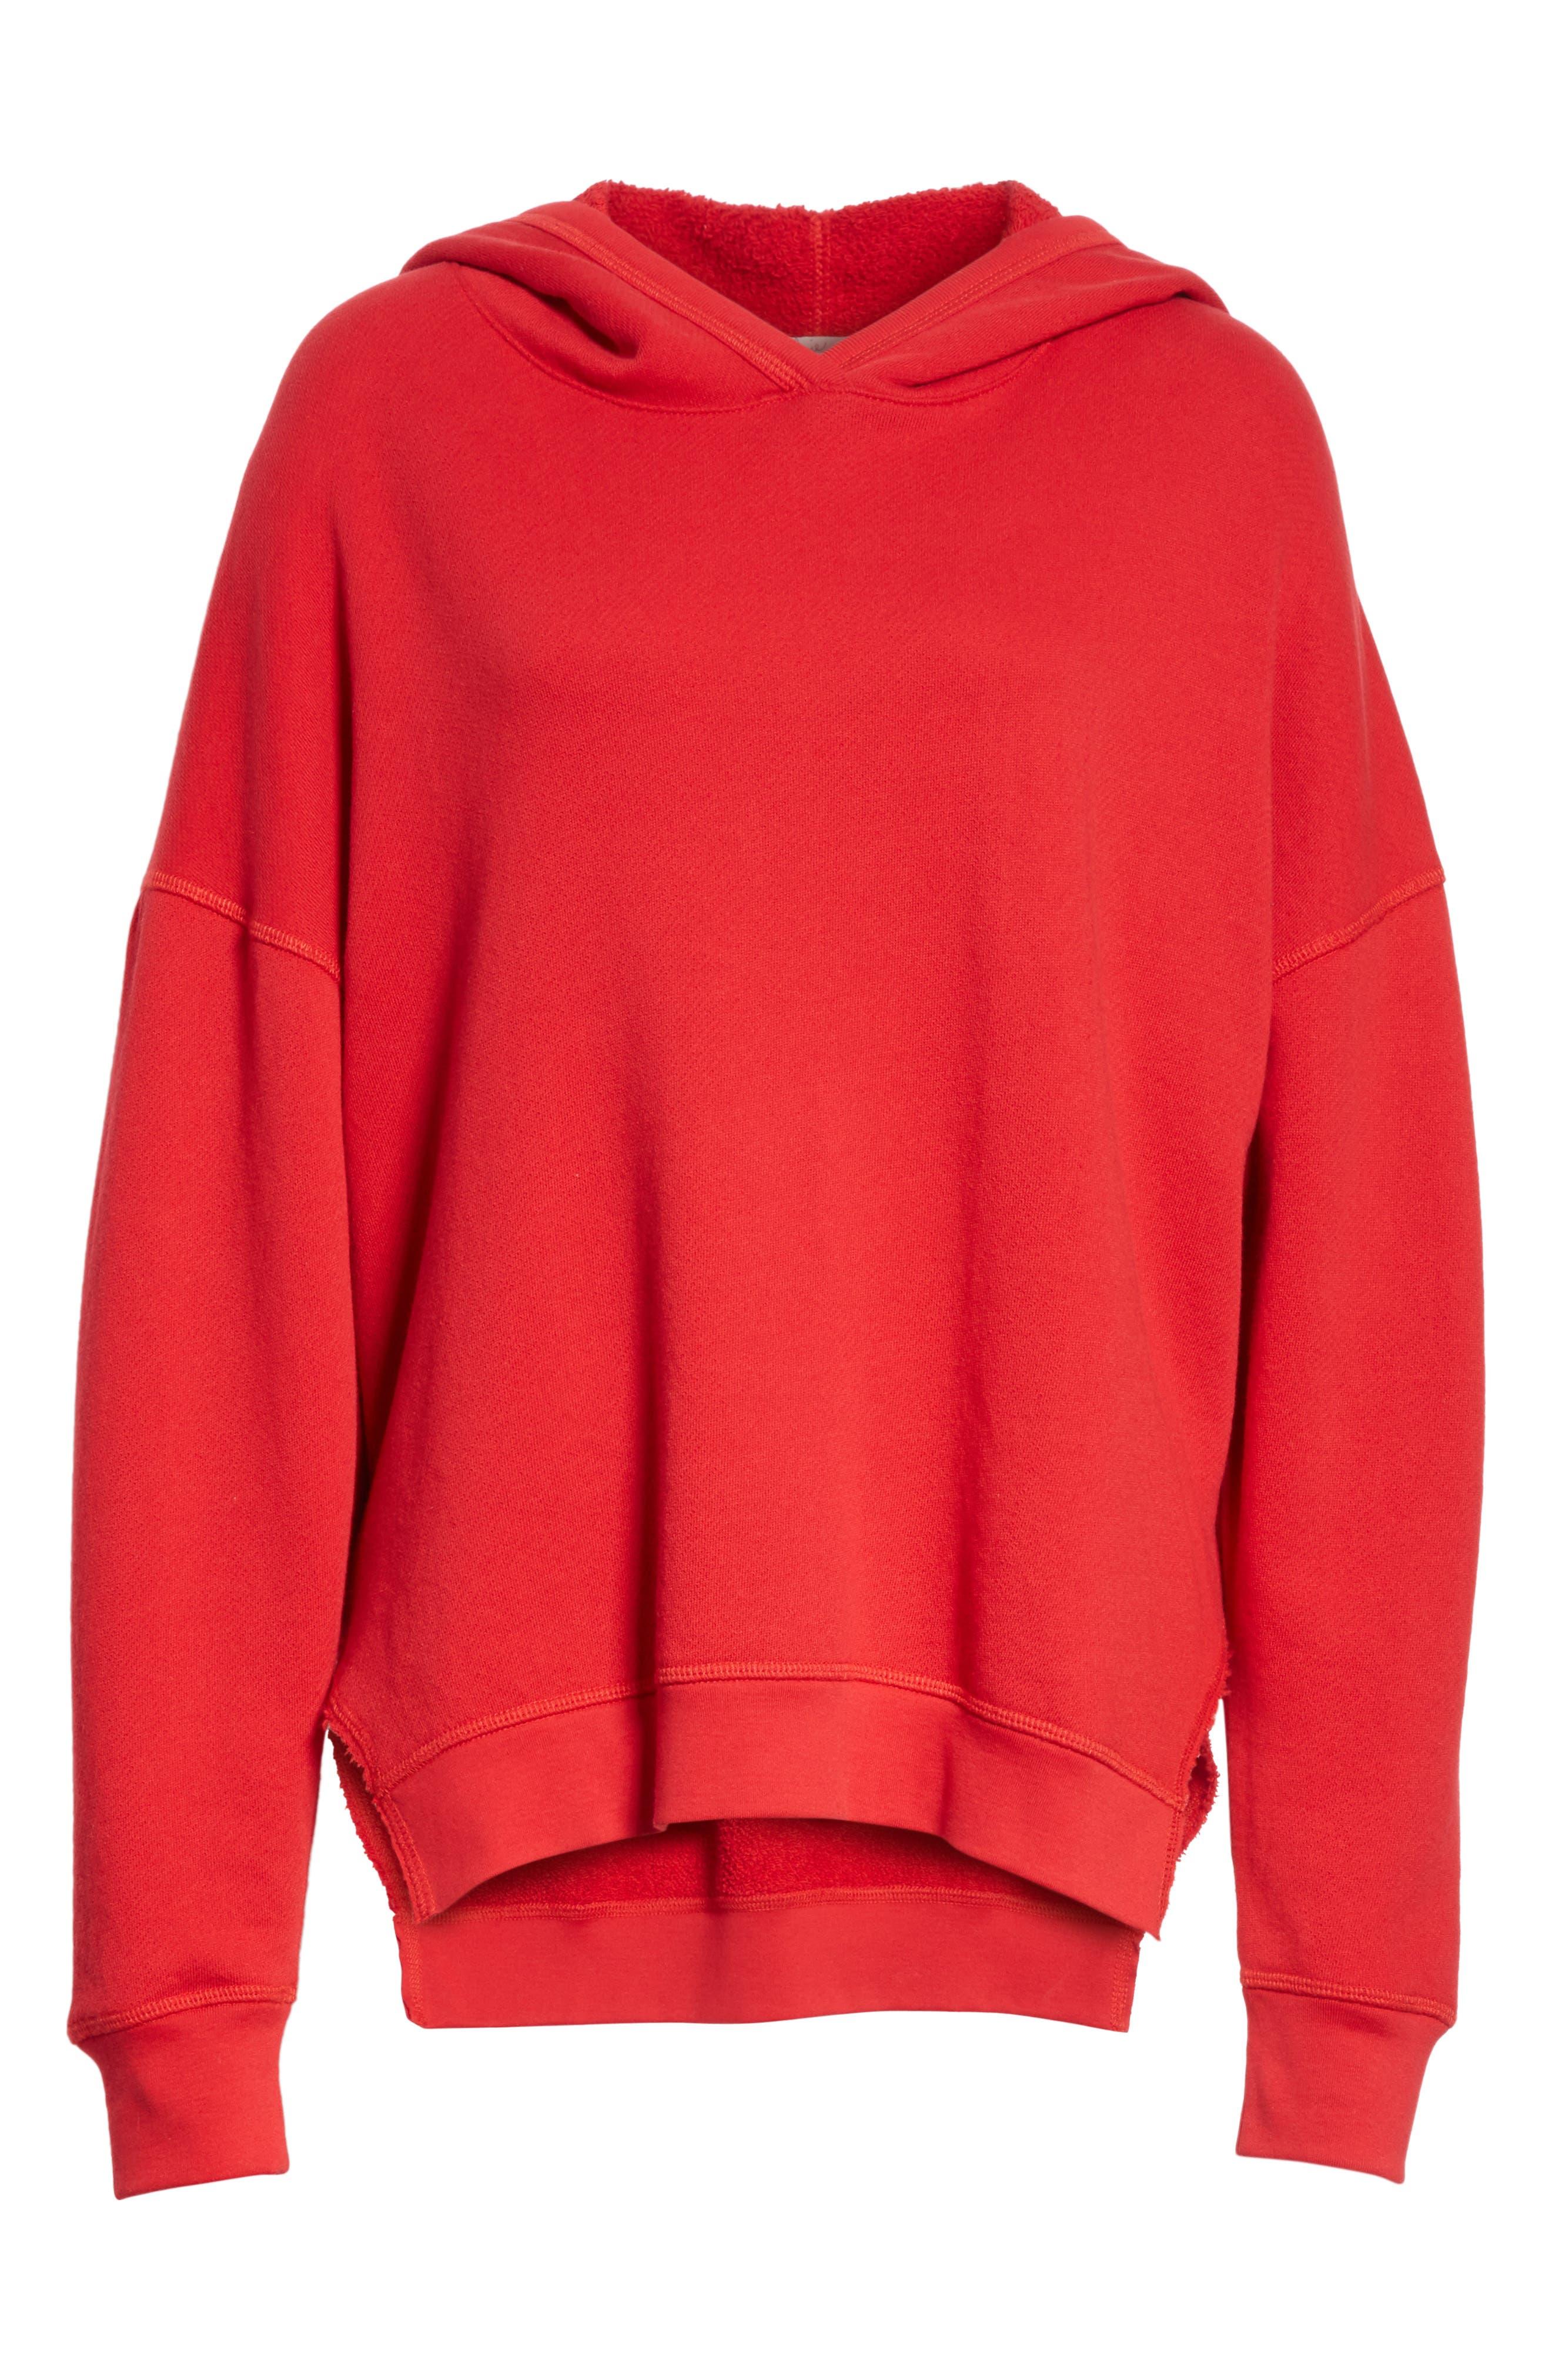 Adene Hooded Sweatshirt,                             Alternate thumbnail 6, color,                             Matador Red